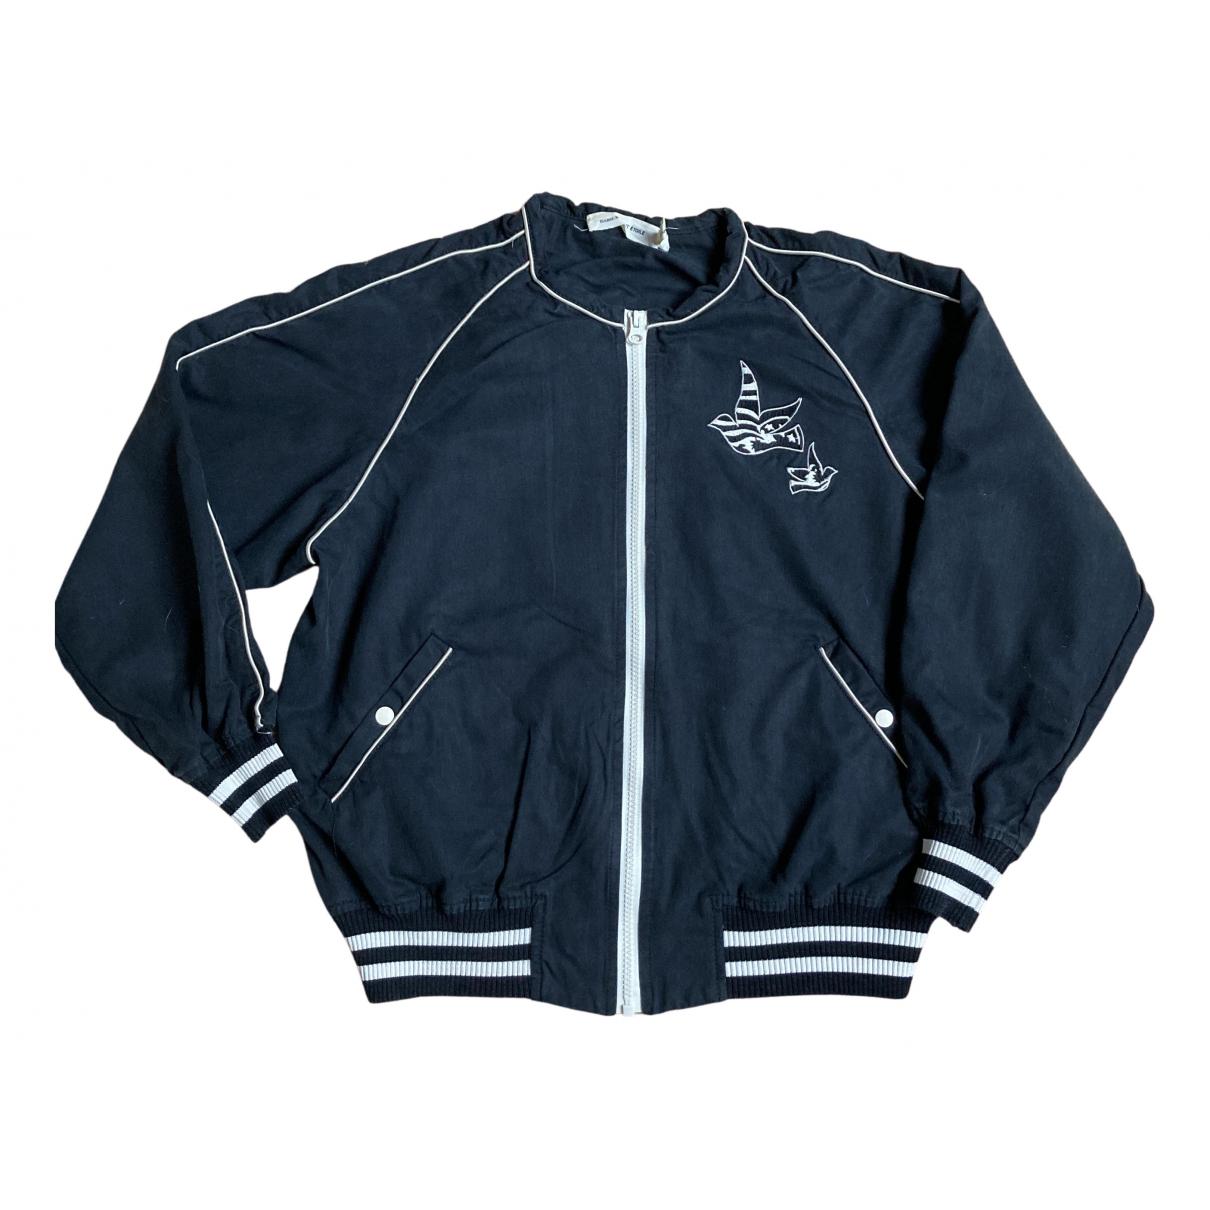 Isabel Marant Etoile N Blue Cotton jacket for Women 38 FR